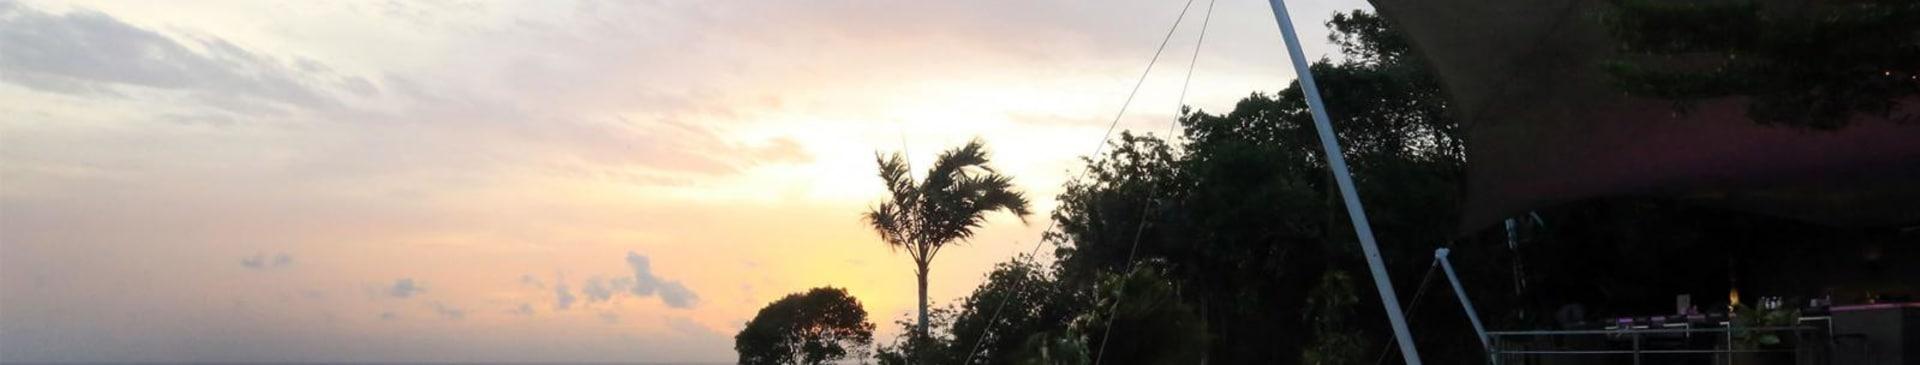 Phukets' best sunset hotspots